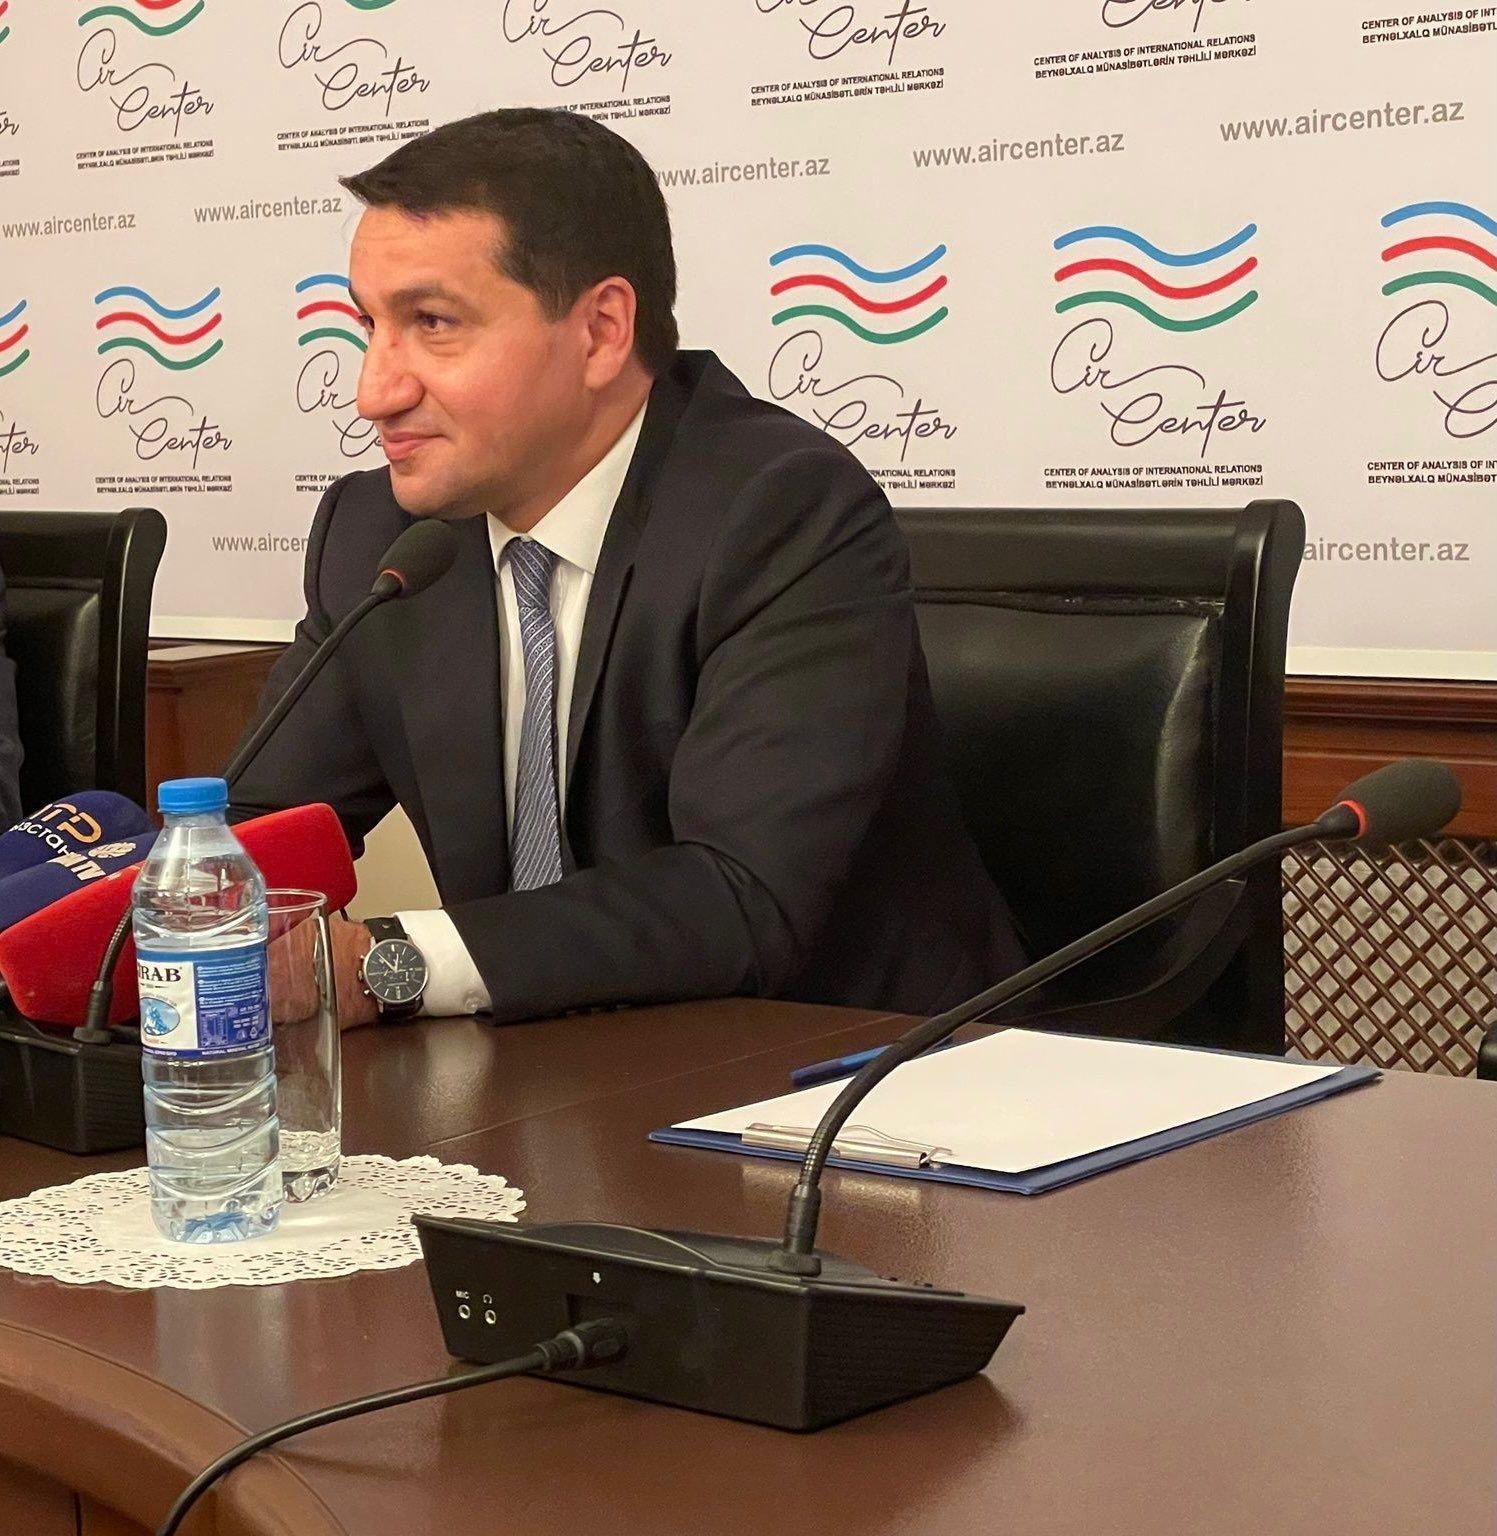 Azerbaijan'sPresidential aide Hikmet Hajiyev addresses reporters in Baku, Azerbaijan, Sept. 3, 2021. (Photo by Kenan Kıran)